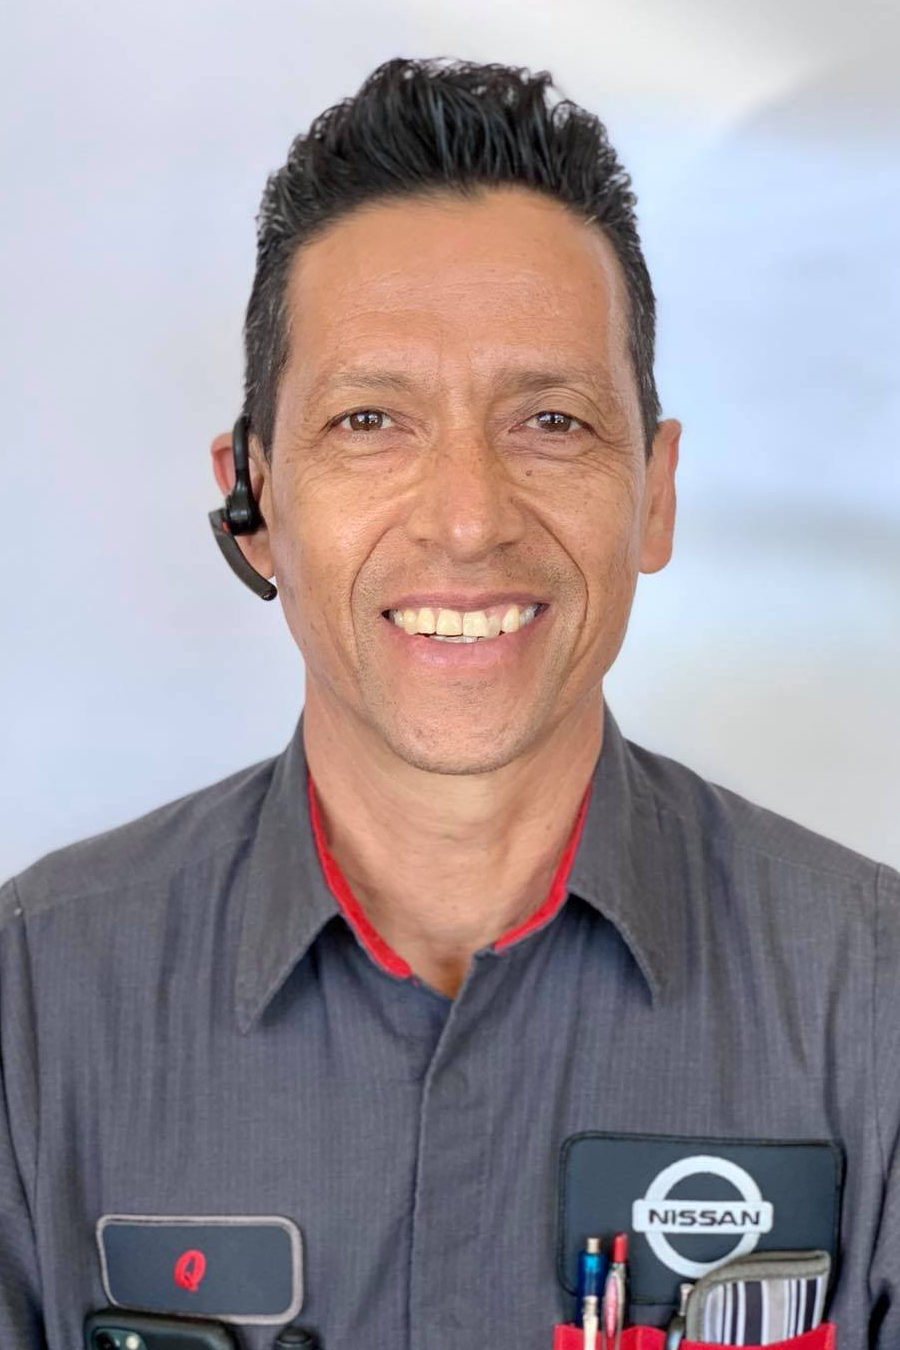 Quirino Aguilera